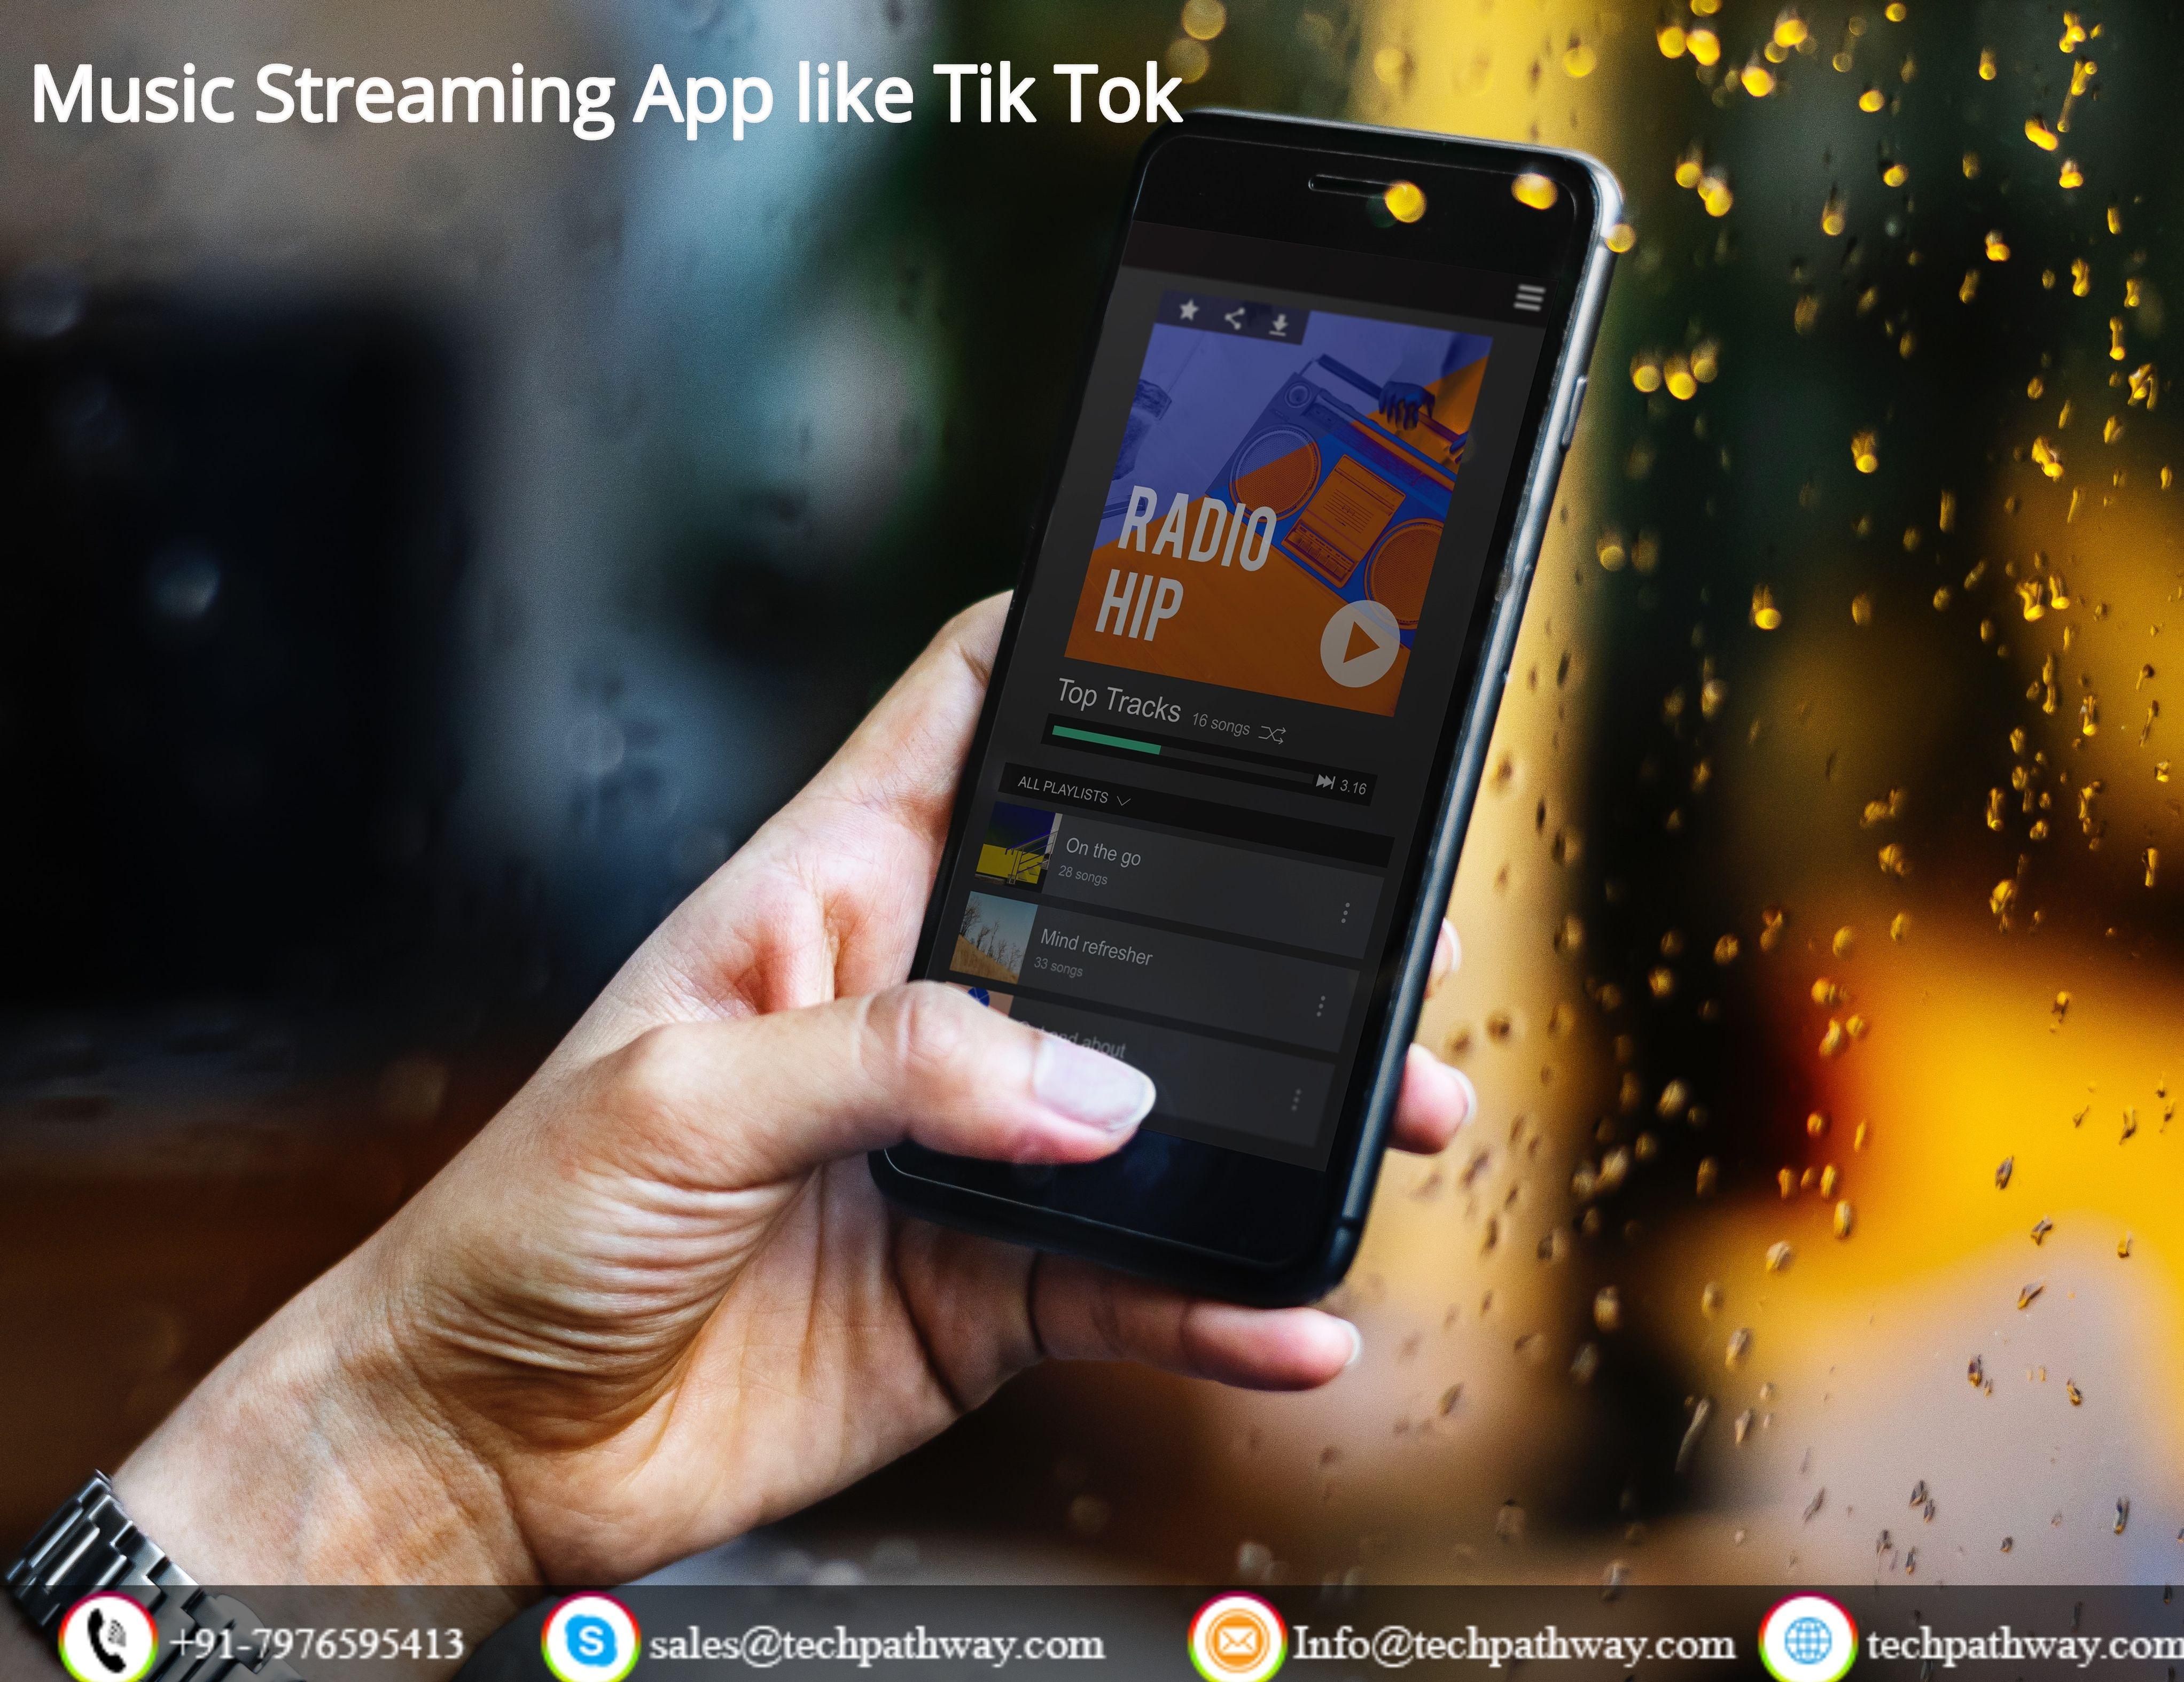 Develop A Music Streaming App Like Tik Tok Music Streaming App Music Streaming Smartphone Applications